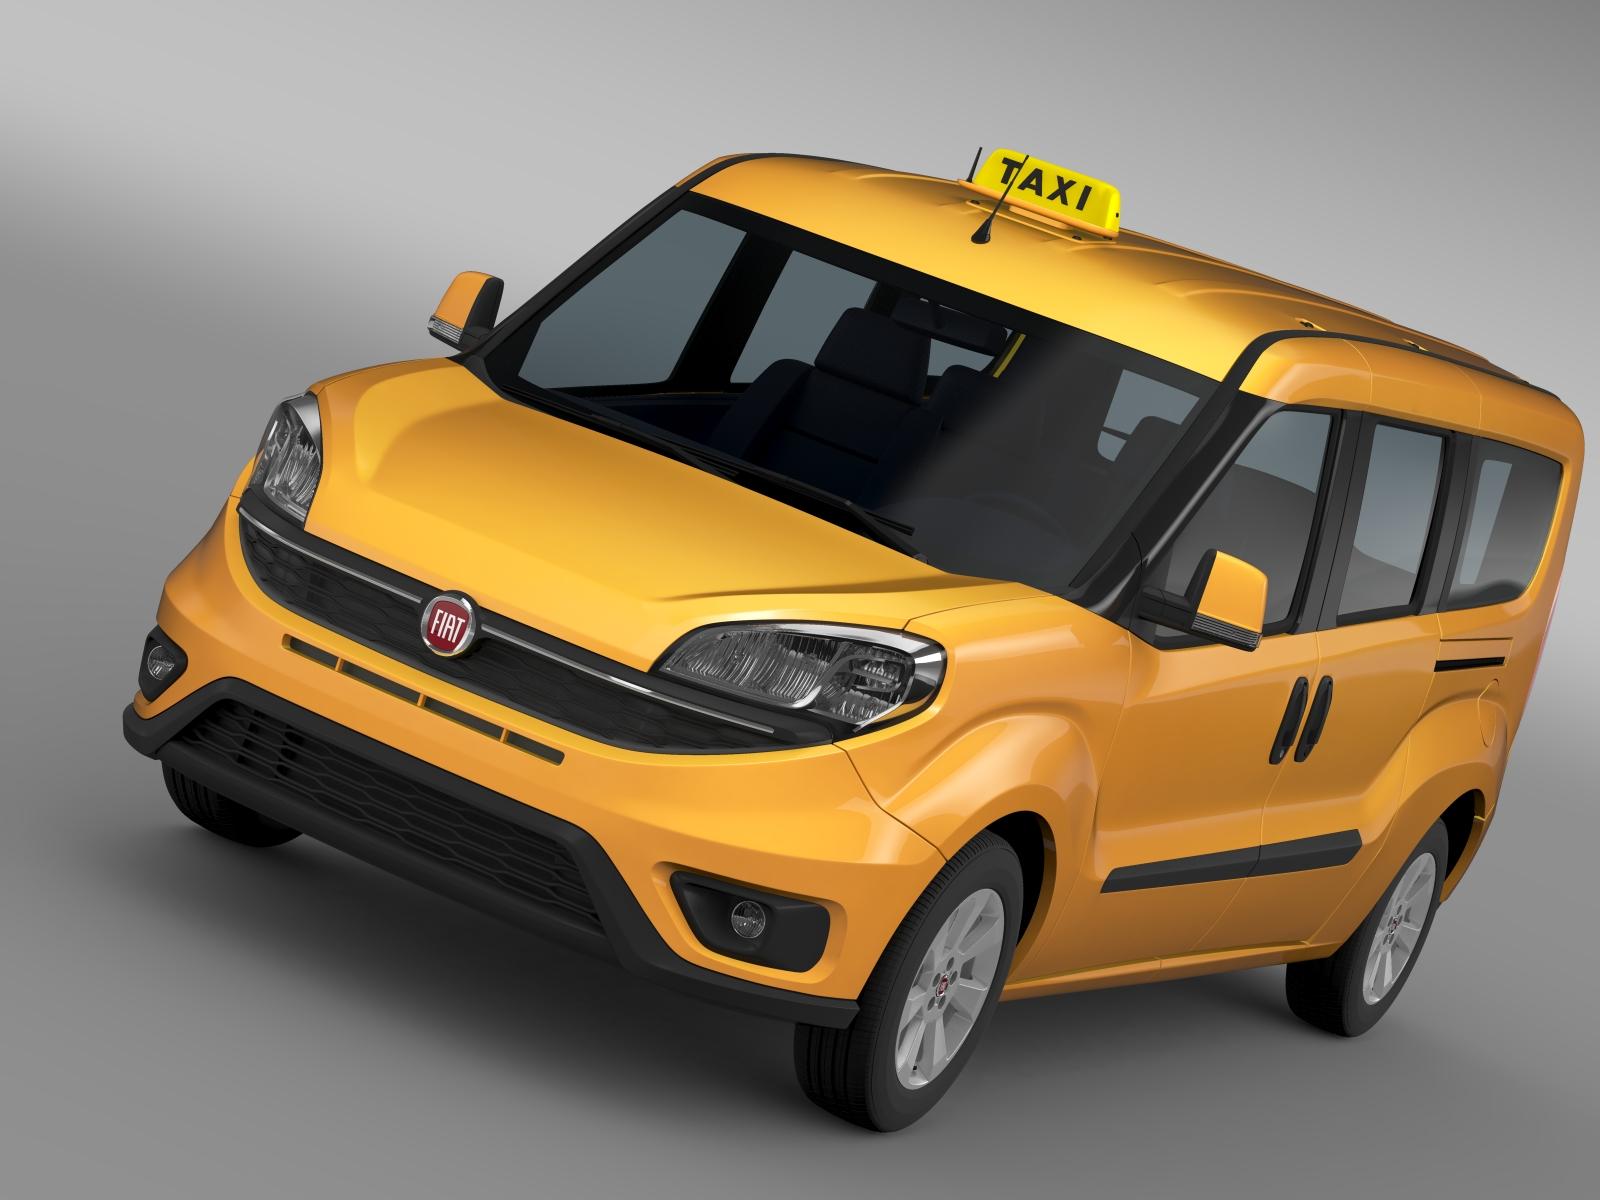 fiat doblo maxi taxi 152 2015 3d model 3ds max fbx c4d lwo ma mb hrc xsi obj 211669